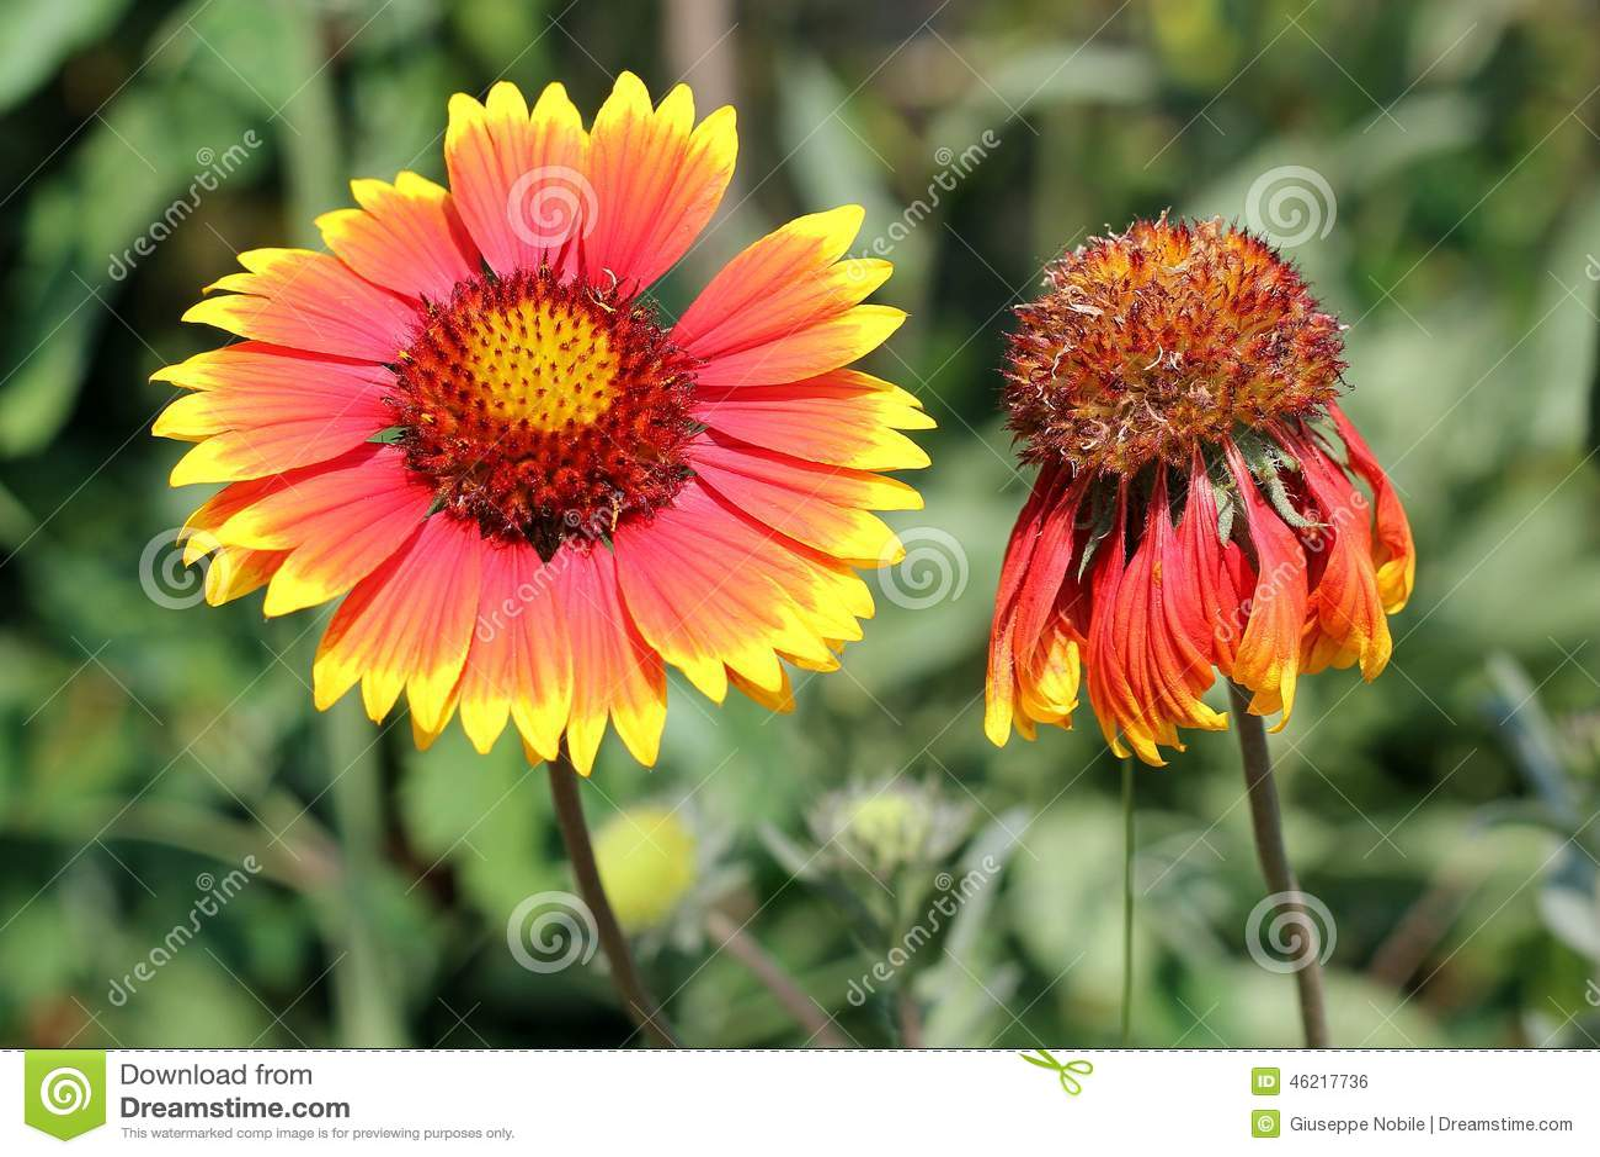 Gaillardia Stock Photo Image Of Floral Floriculture 46217736